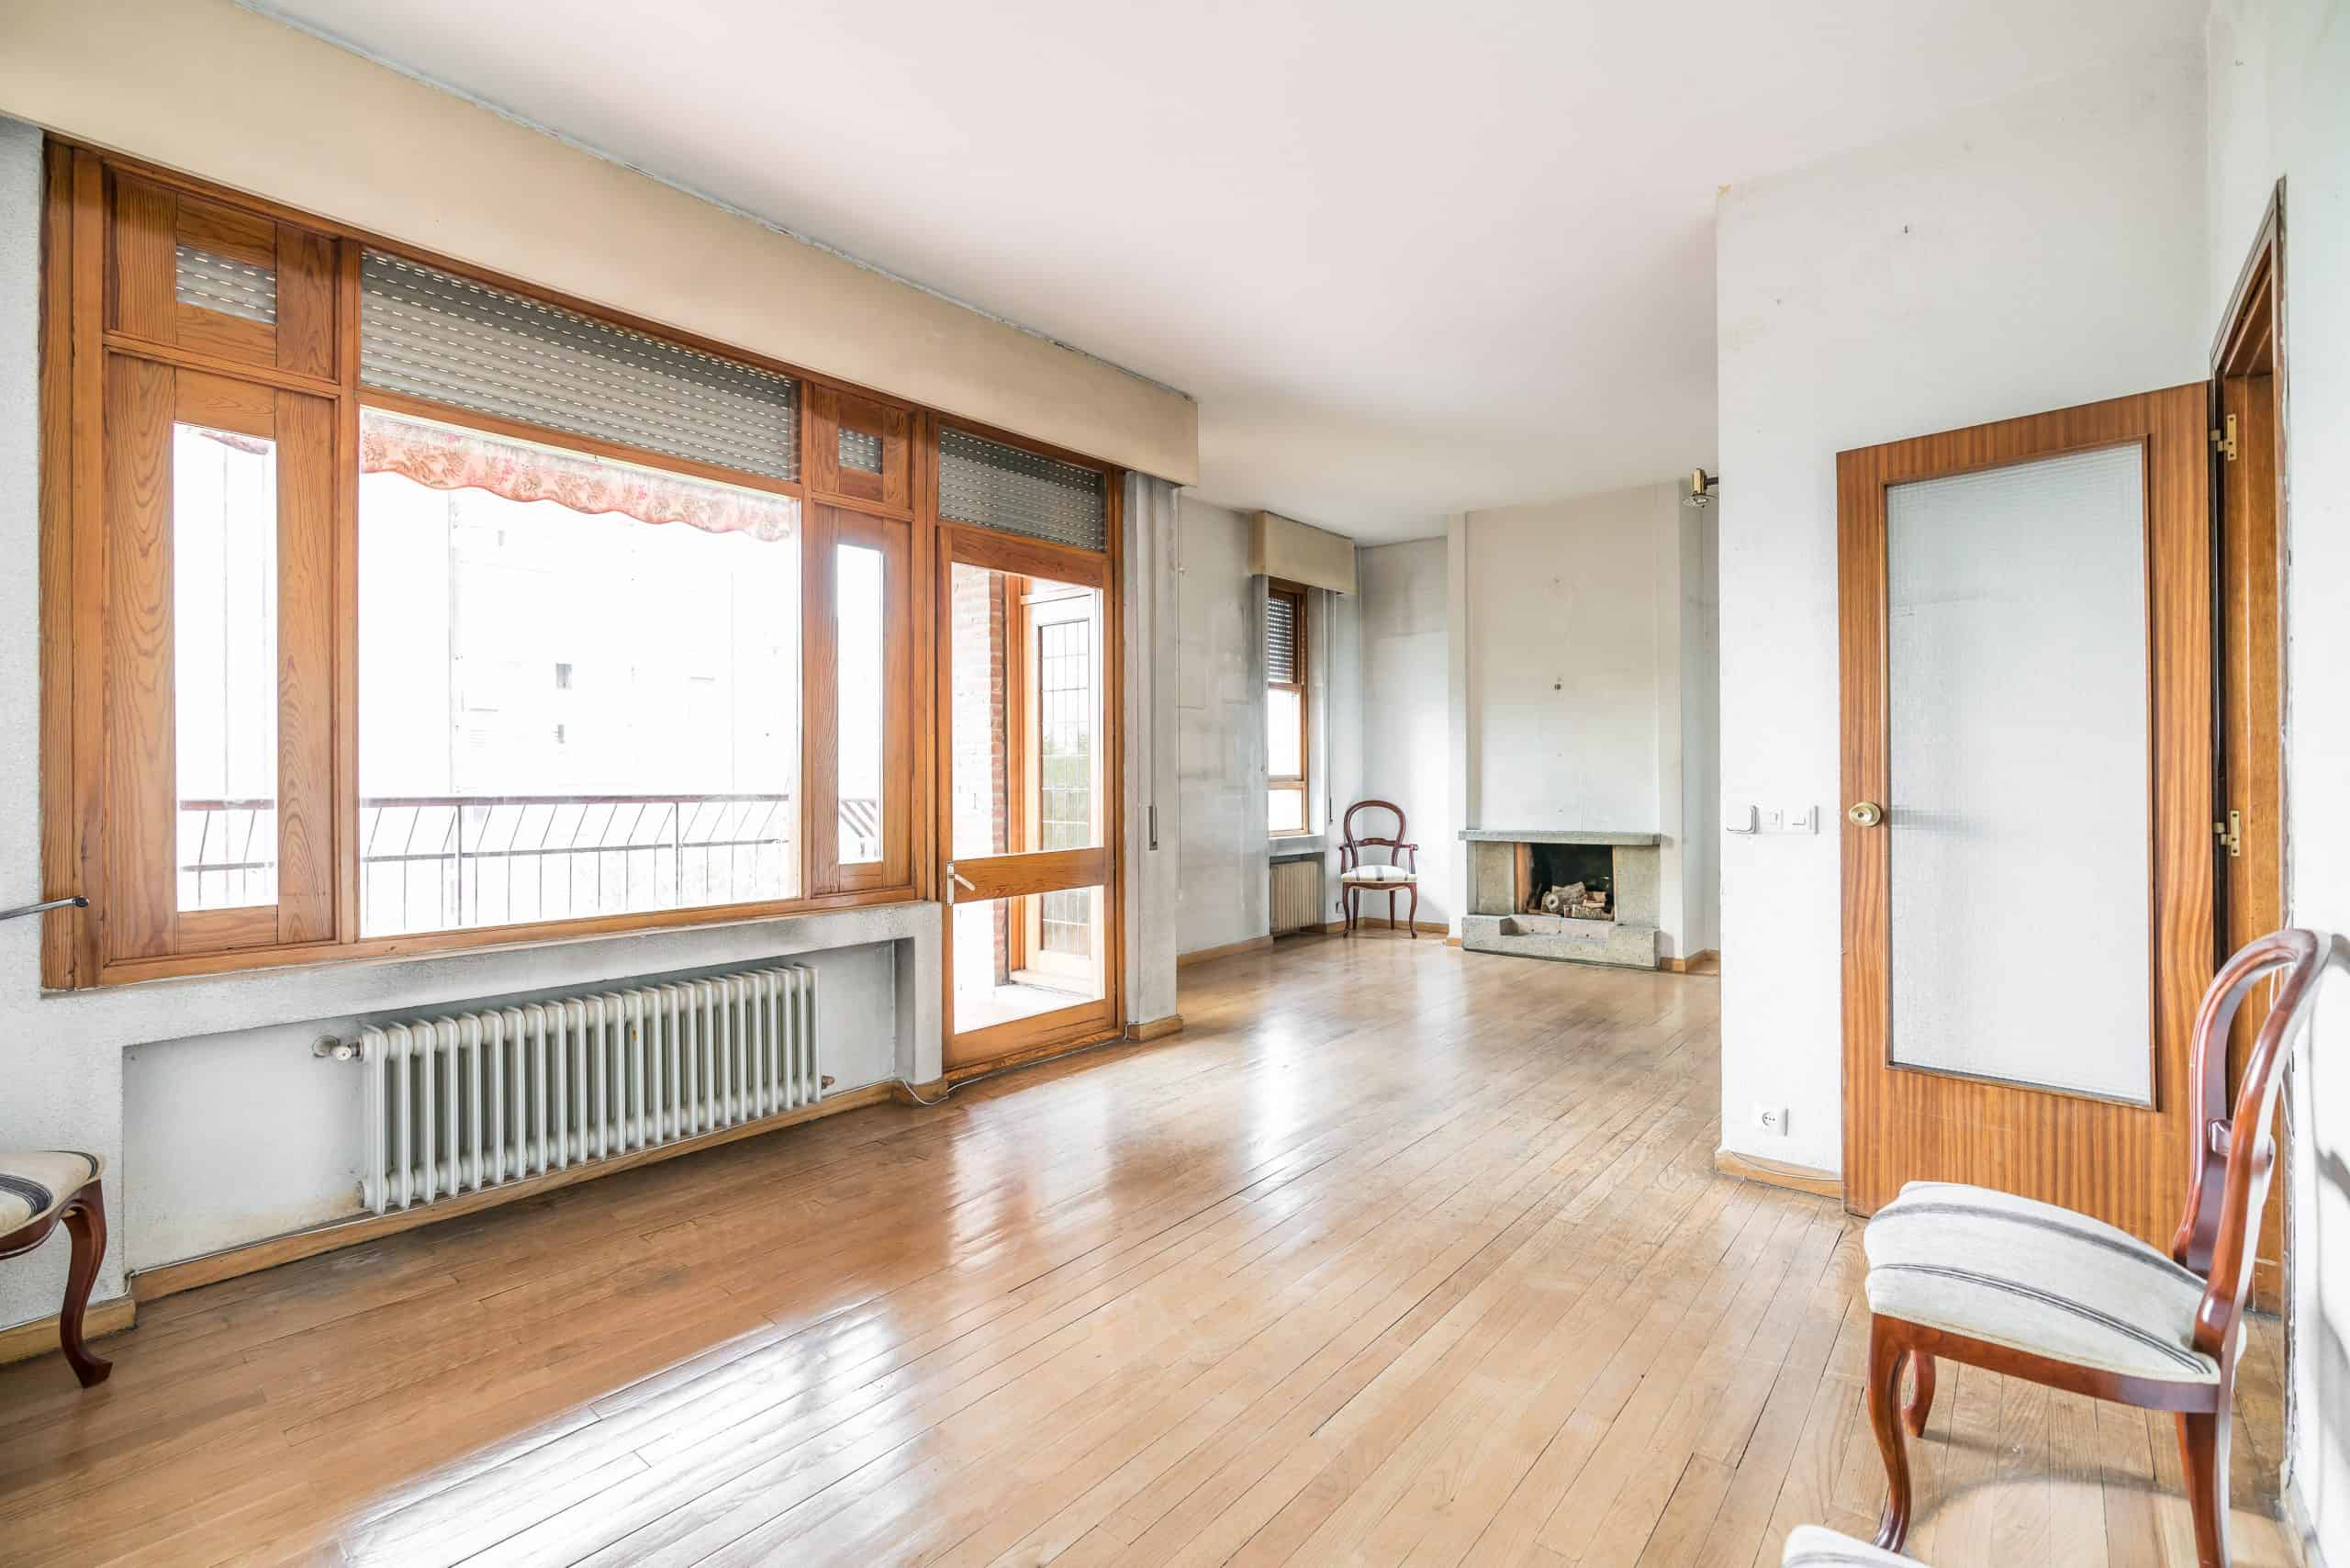 Agencia Inmobiliaria de Madrid-FUTUROCASA-Zona ARGANZUELA-EMBAJADORES-LEGAZPI -calle Embajadores- baño 1